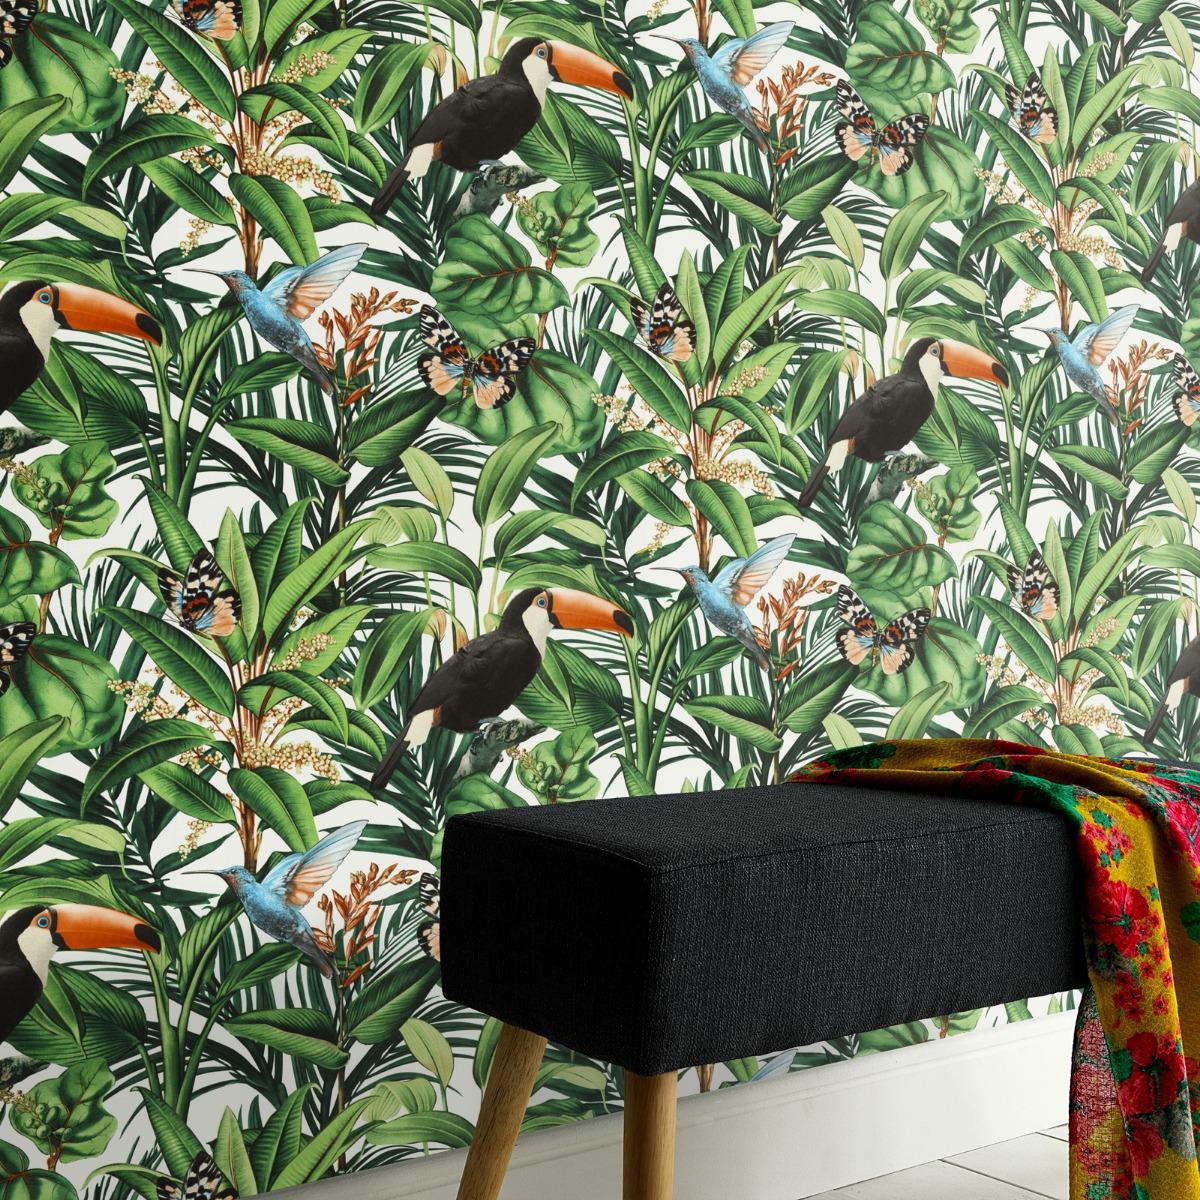 Erismann Paradisio 2 Jungle Birds Wallpaper White (10121-07-BUR)